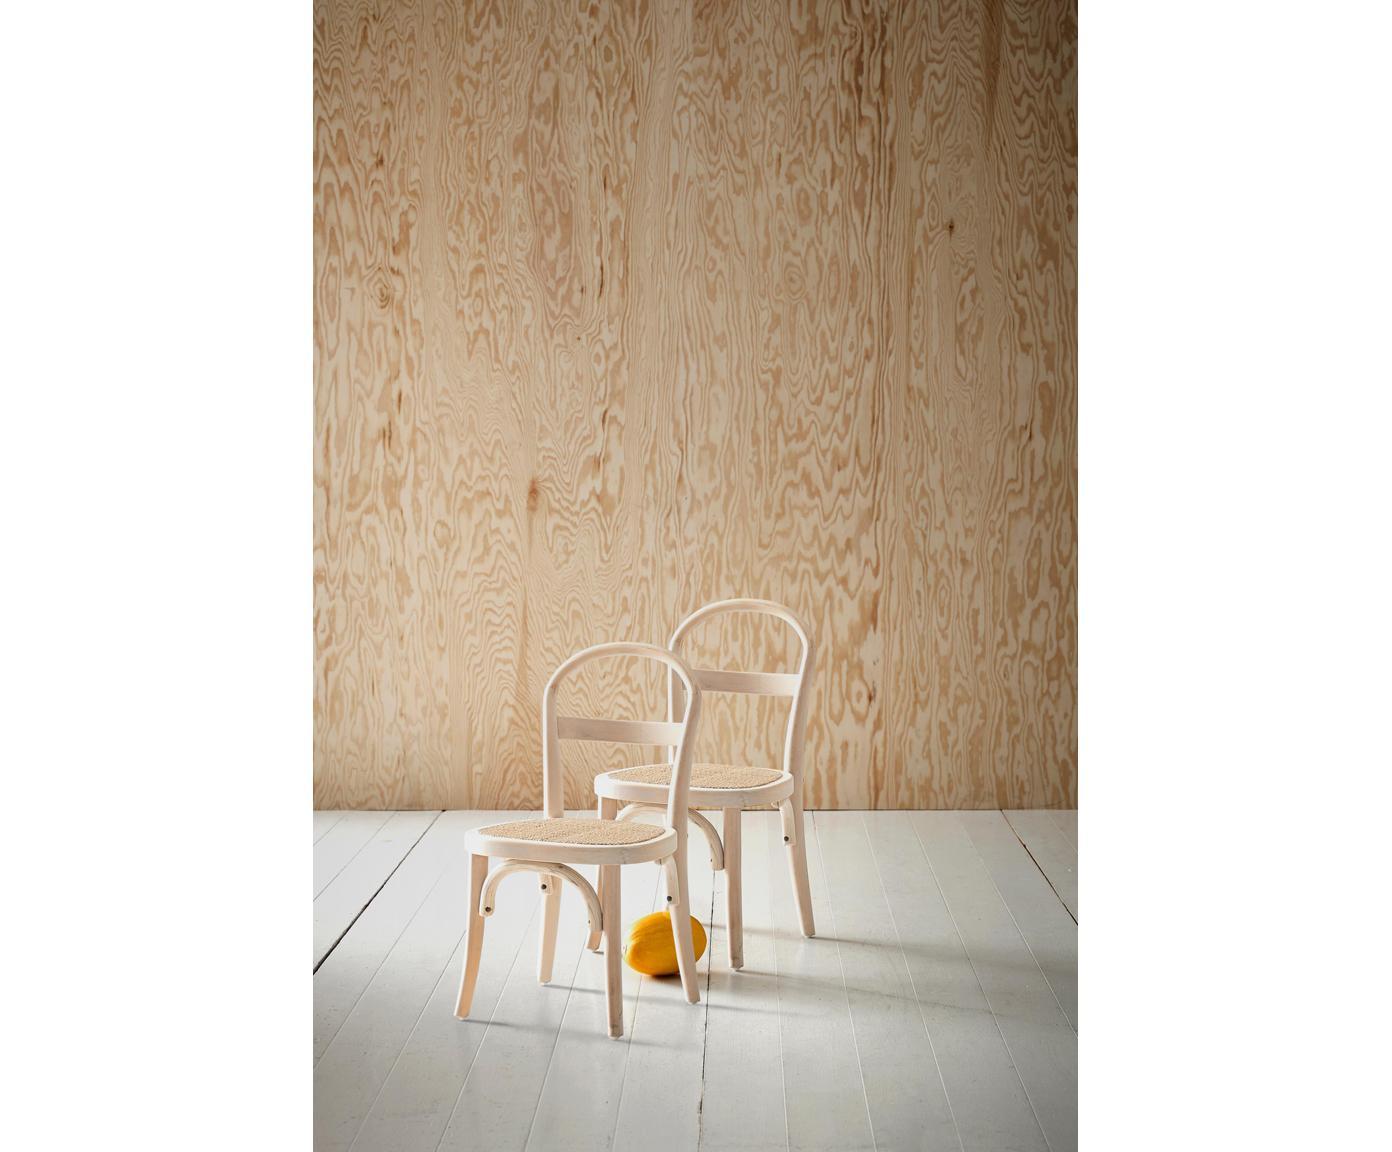 Kinderstühle Rippats, 2 Stück, Birkenholz, Rattan, Birkenholz, Rattan, B 33 x T 35 cm